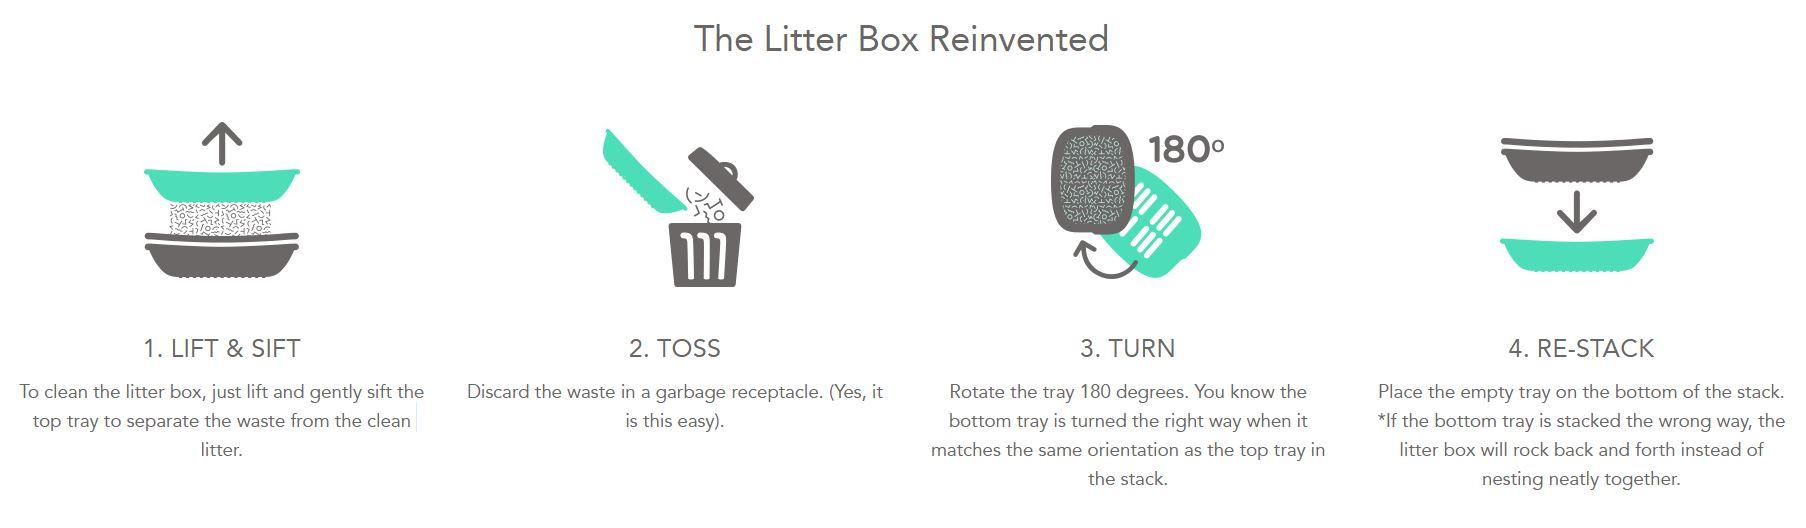 litter-box-reinvented